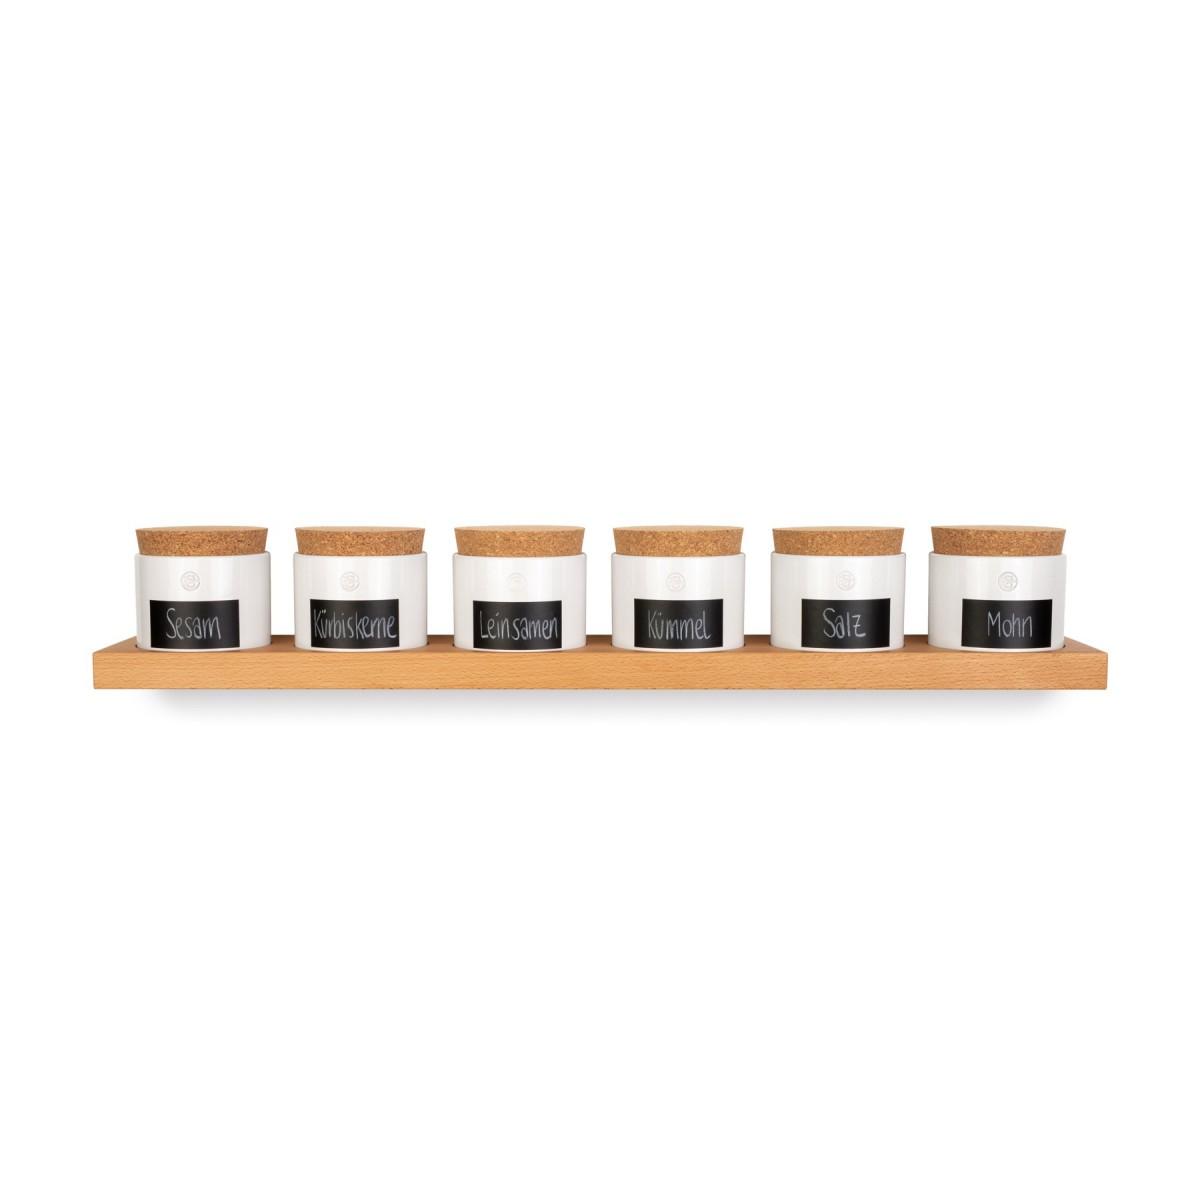 klotzaufklotz Vorratsdosenregal Buche 6er mit kleinen Dosen